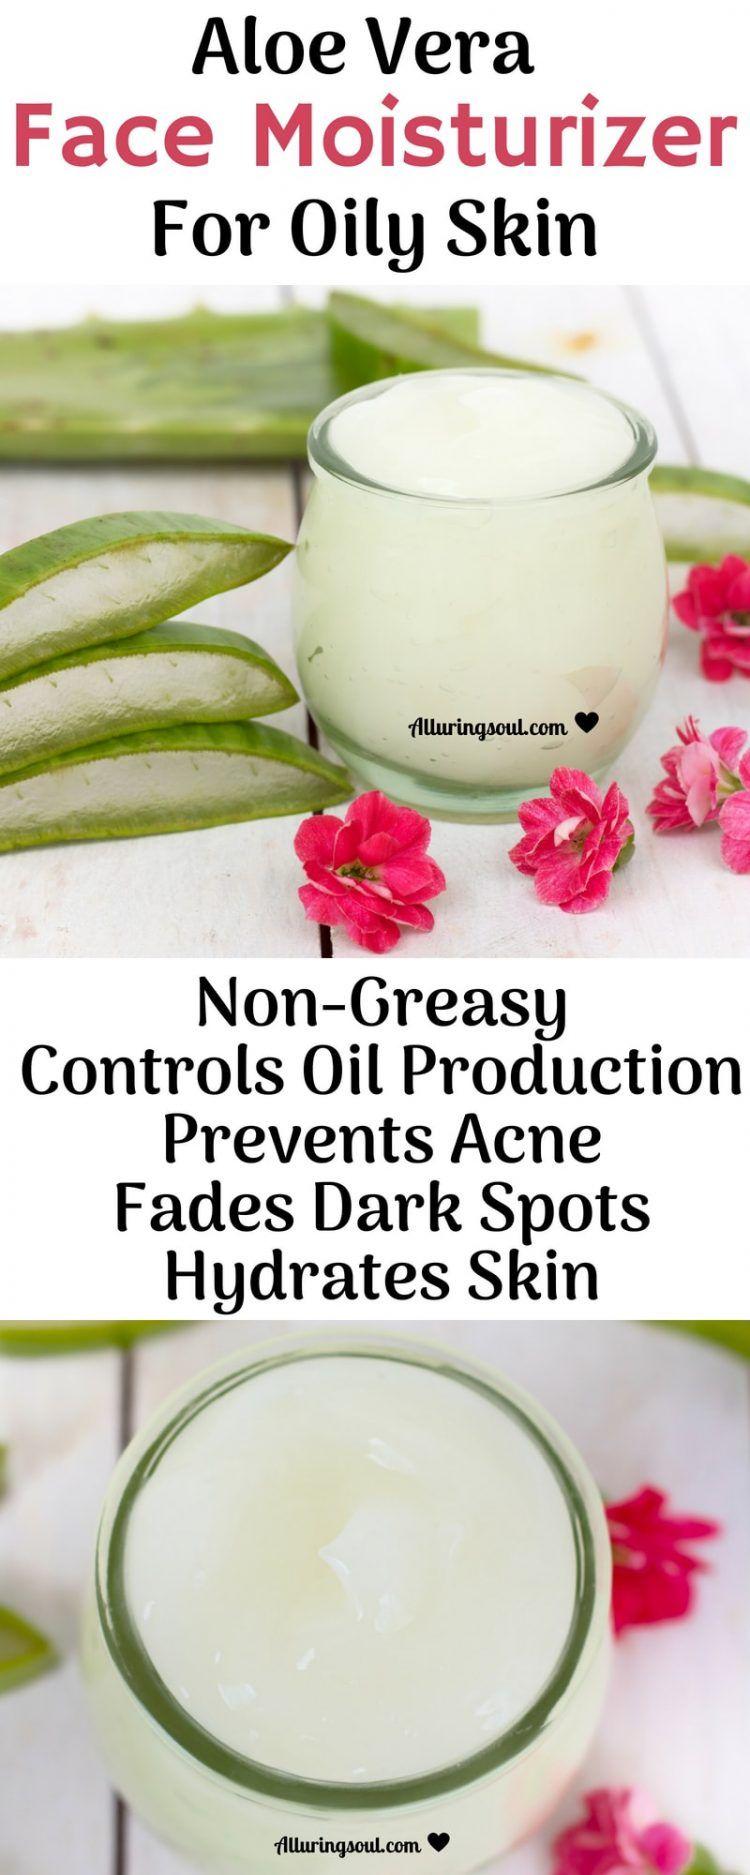 DIY Aloe Vera Face Moisturizer For Oily Skin -   16 skin care Face moisturizer ideas